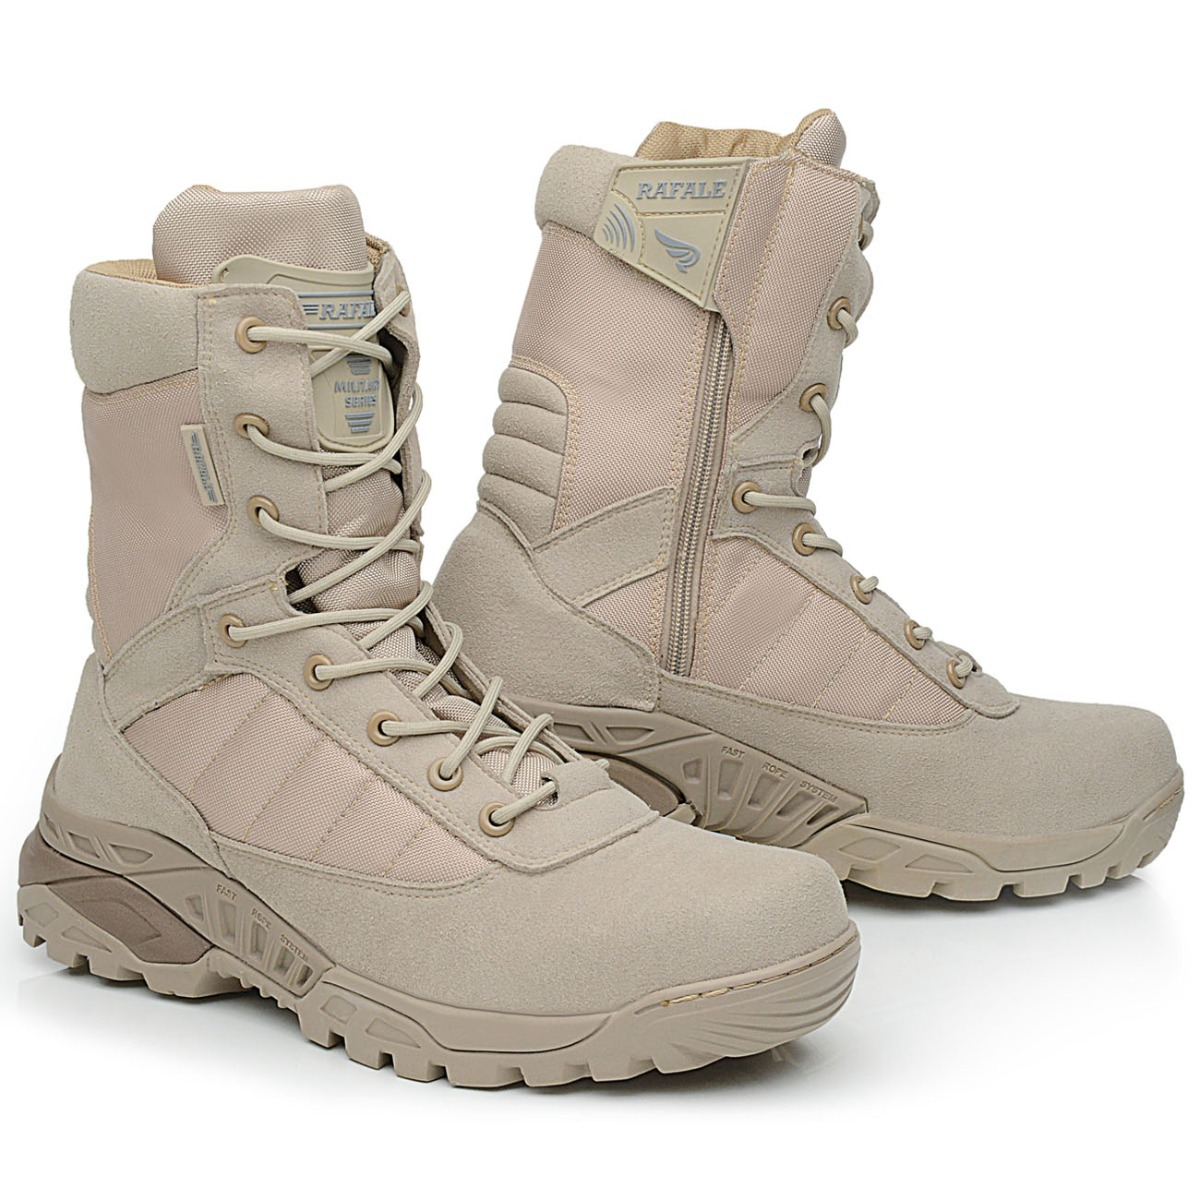 2b7714ebed629 ... 454fde187f4 Bota Coturno Tático Militar Viper Rafale Couro - R 258,00  em . ...